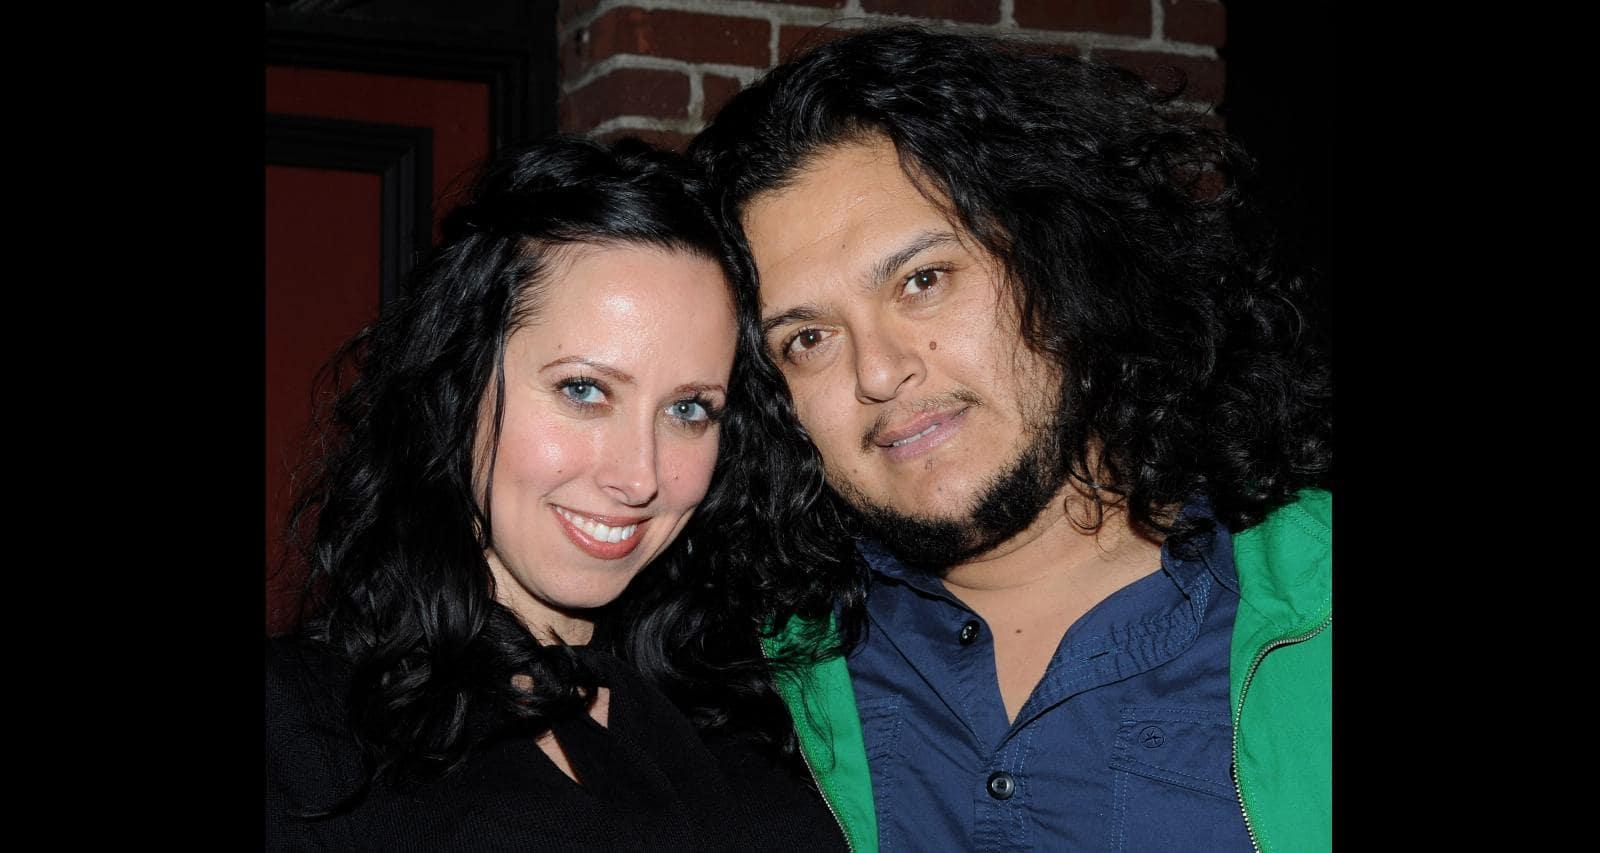 Lesa O'Daniel Wiki, Age, Family, Education, Career, Kids, Husbands and Facts about Felipe Esparza's Wife